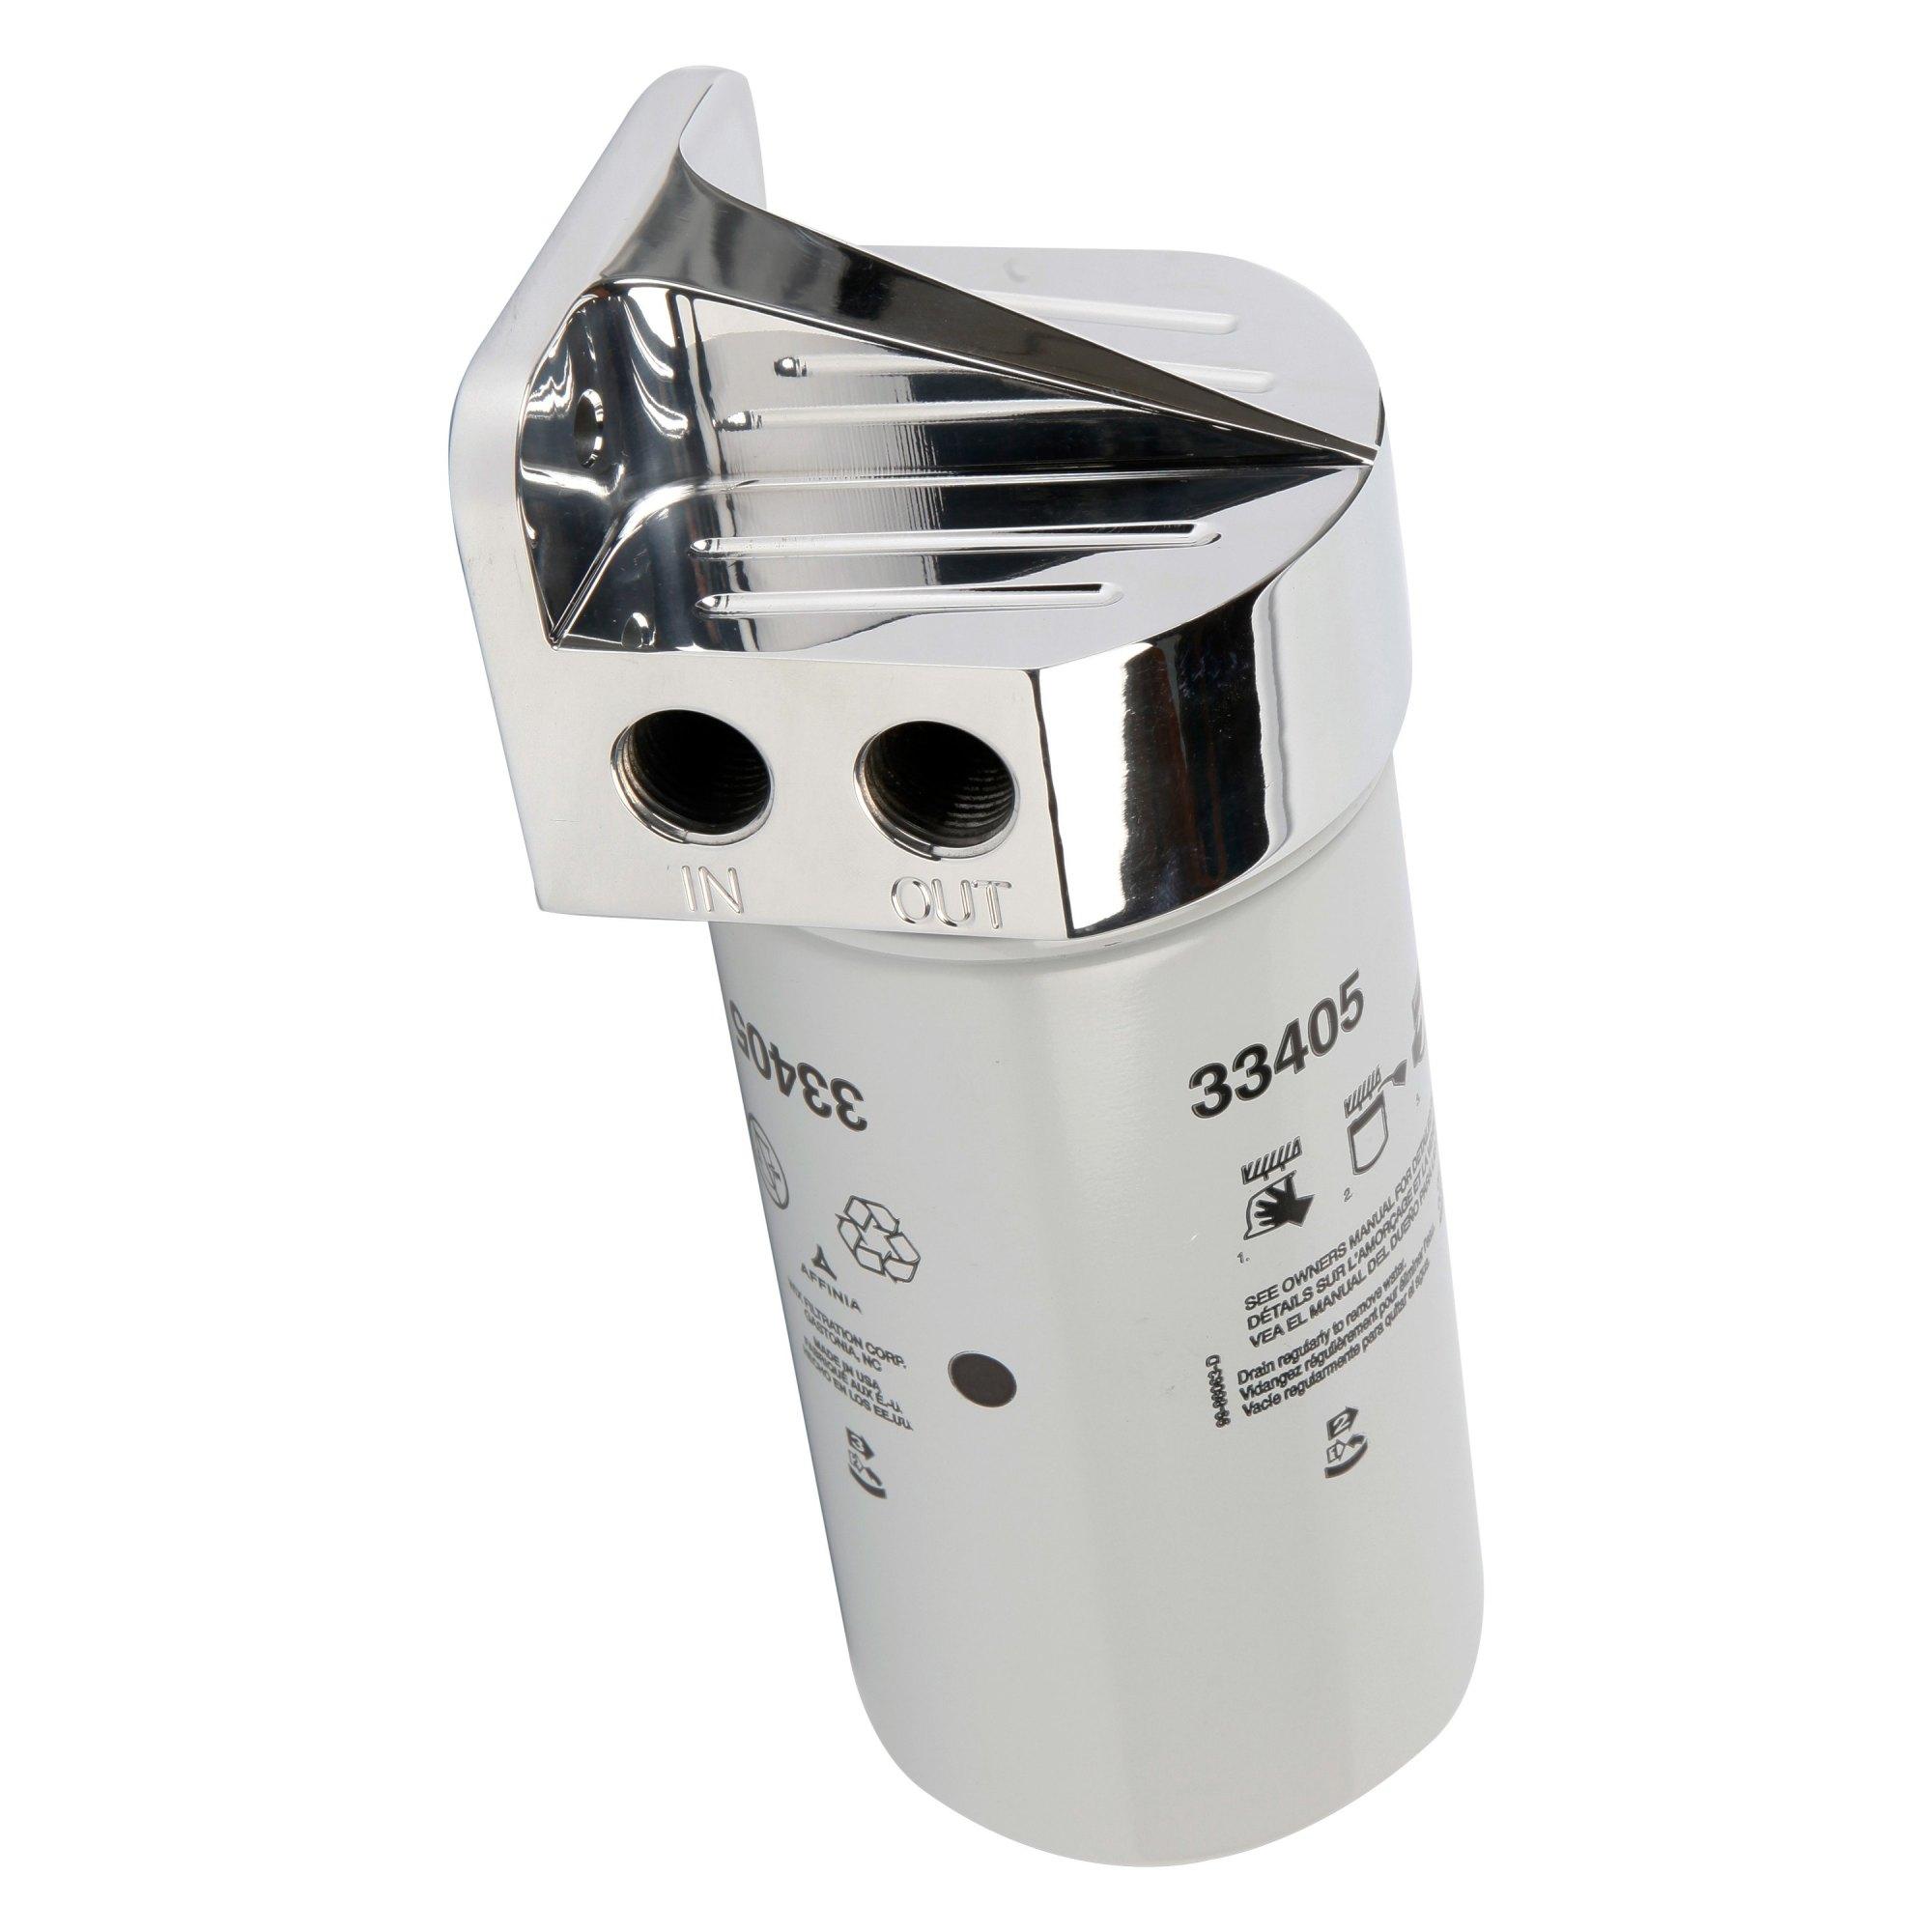 hight resolution of eddie marine fuel filter kit